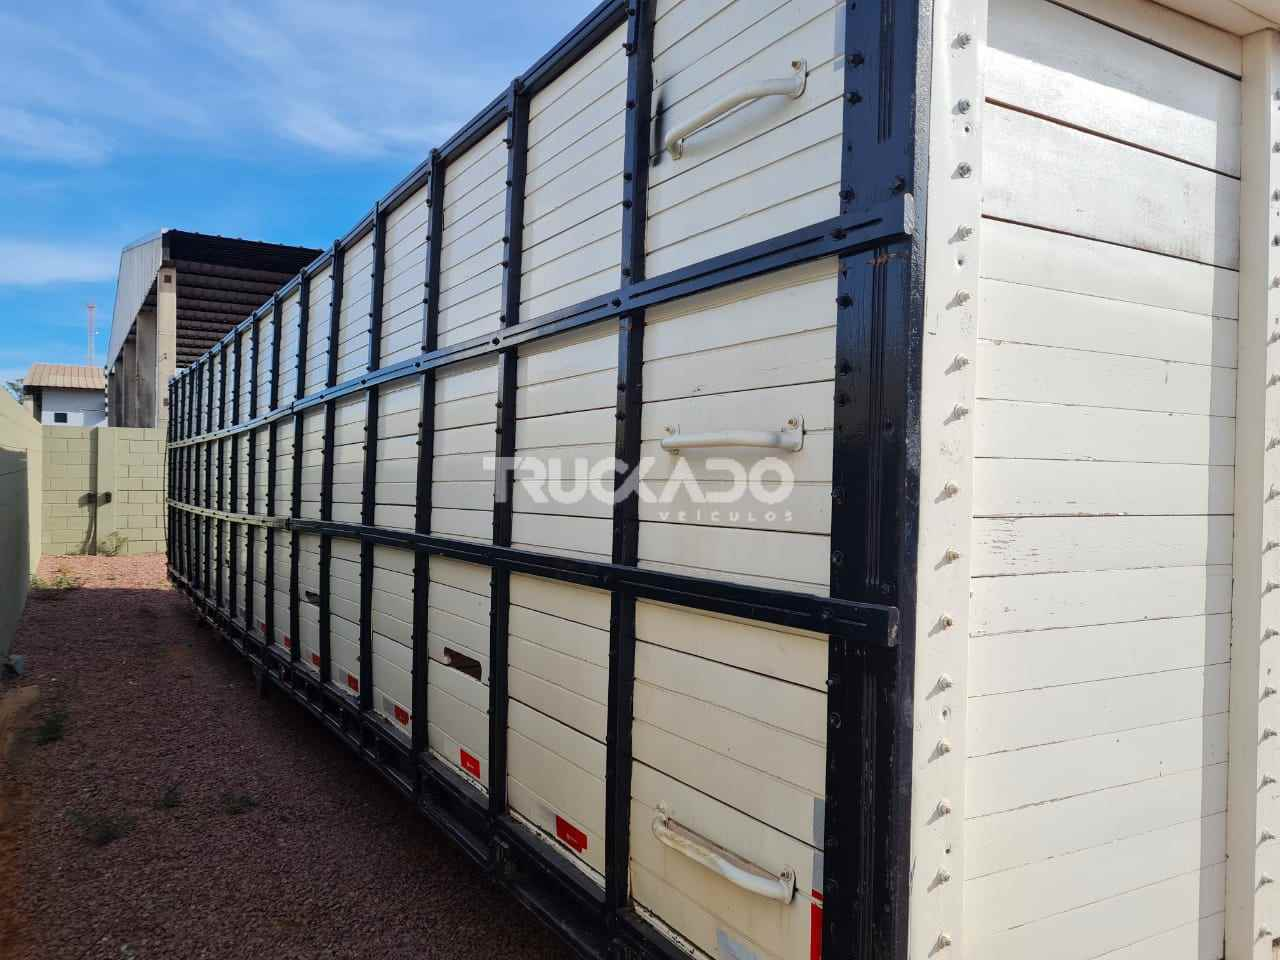 CARROCERIA SOBRE CHASSI  UTILITARIOS BOIADEIRA Truckado Veículos SINOP MATO GROSSO MT